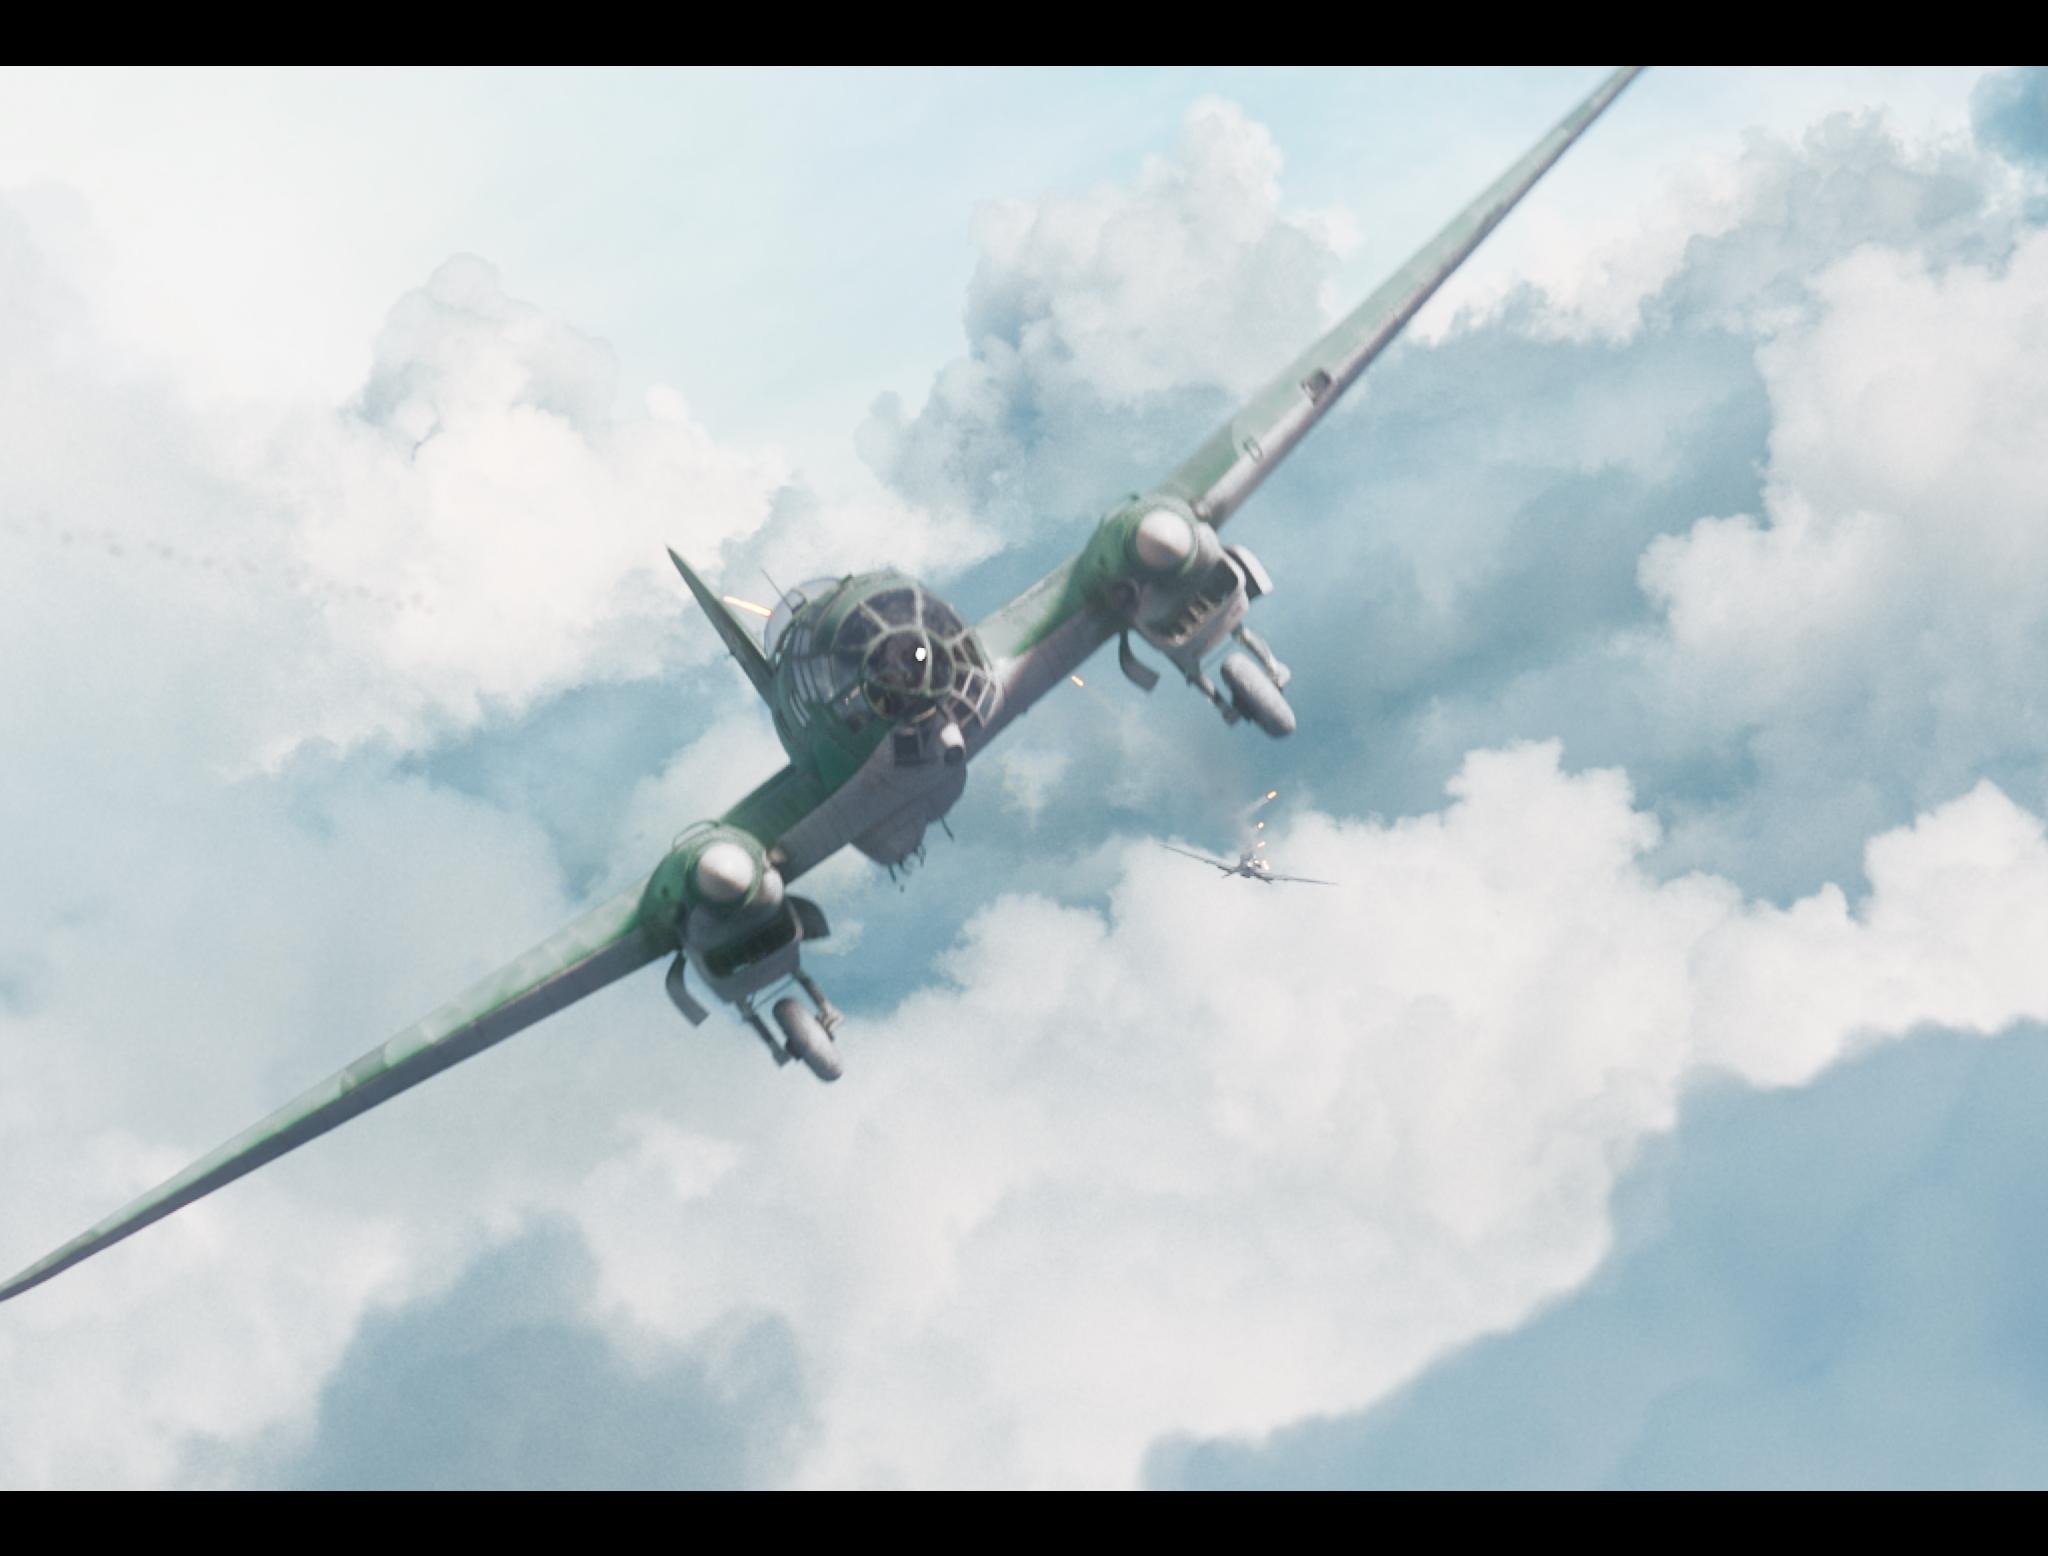 War Thunder и технологии видеоигр: как Тимур Бекмамбетов воссоздал подвиг летчика Девятаева в кино